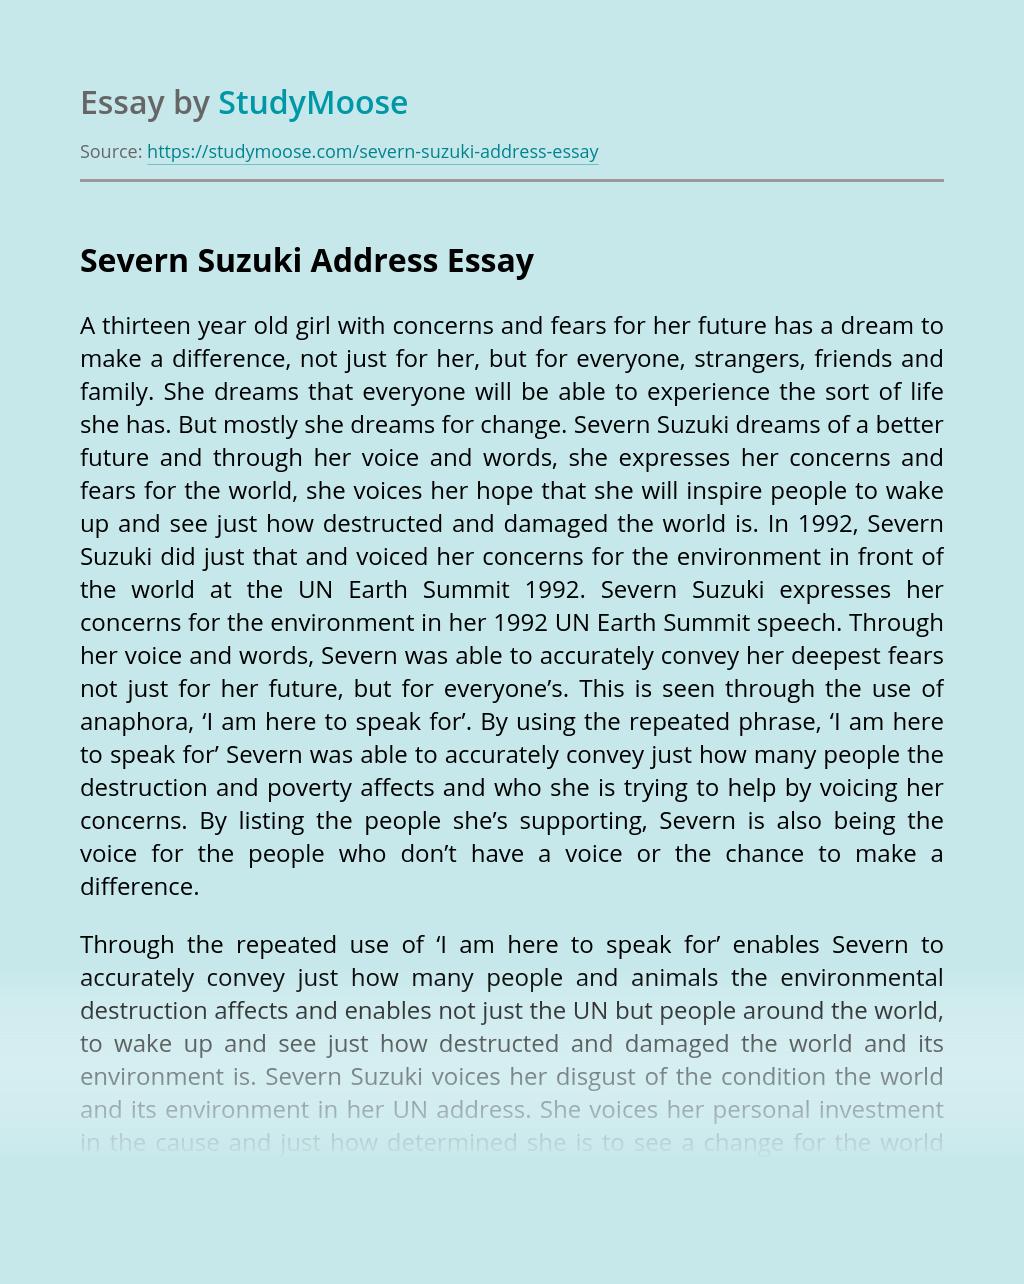 Severn Suzuki Address